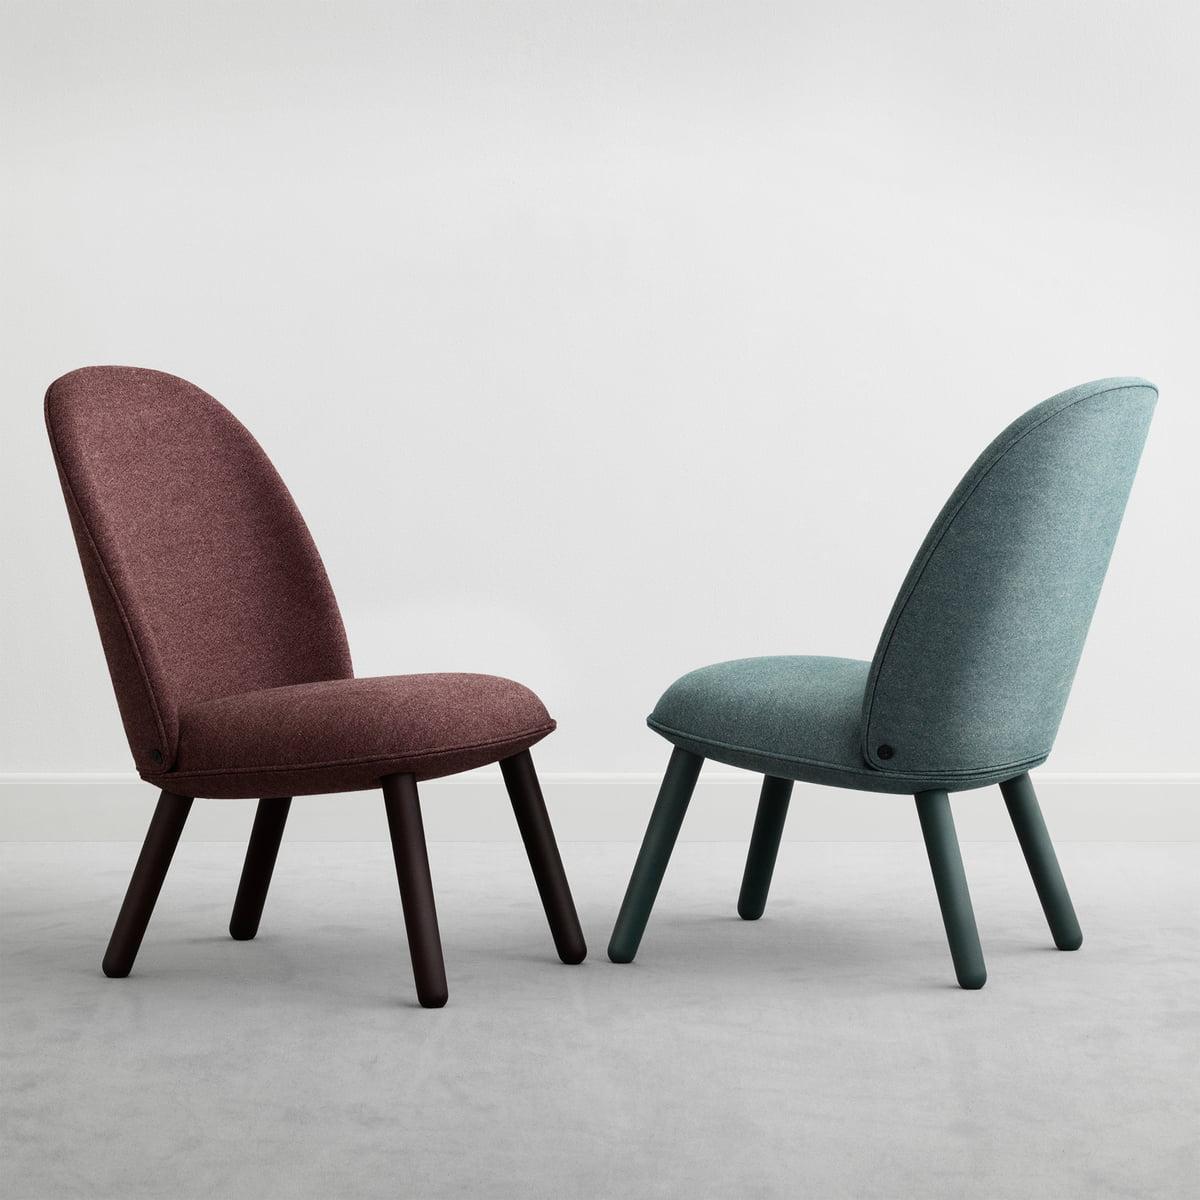 ace lounge chair nist from normann copenhagen. Black Bedroom Furniture Sets. Home Design Ideas